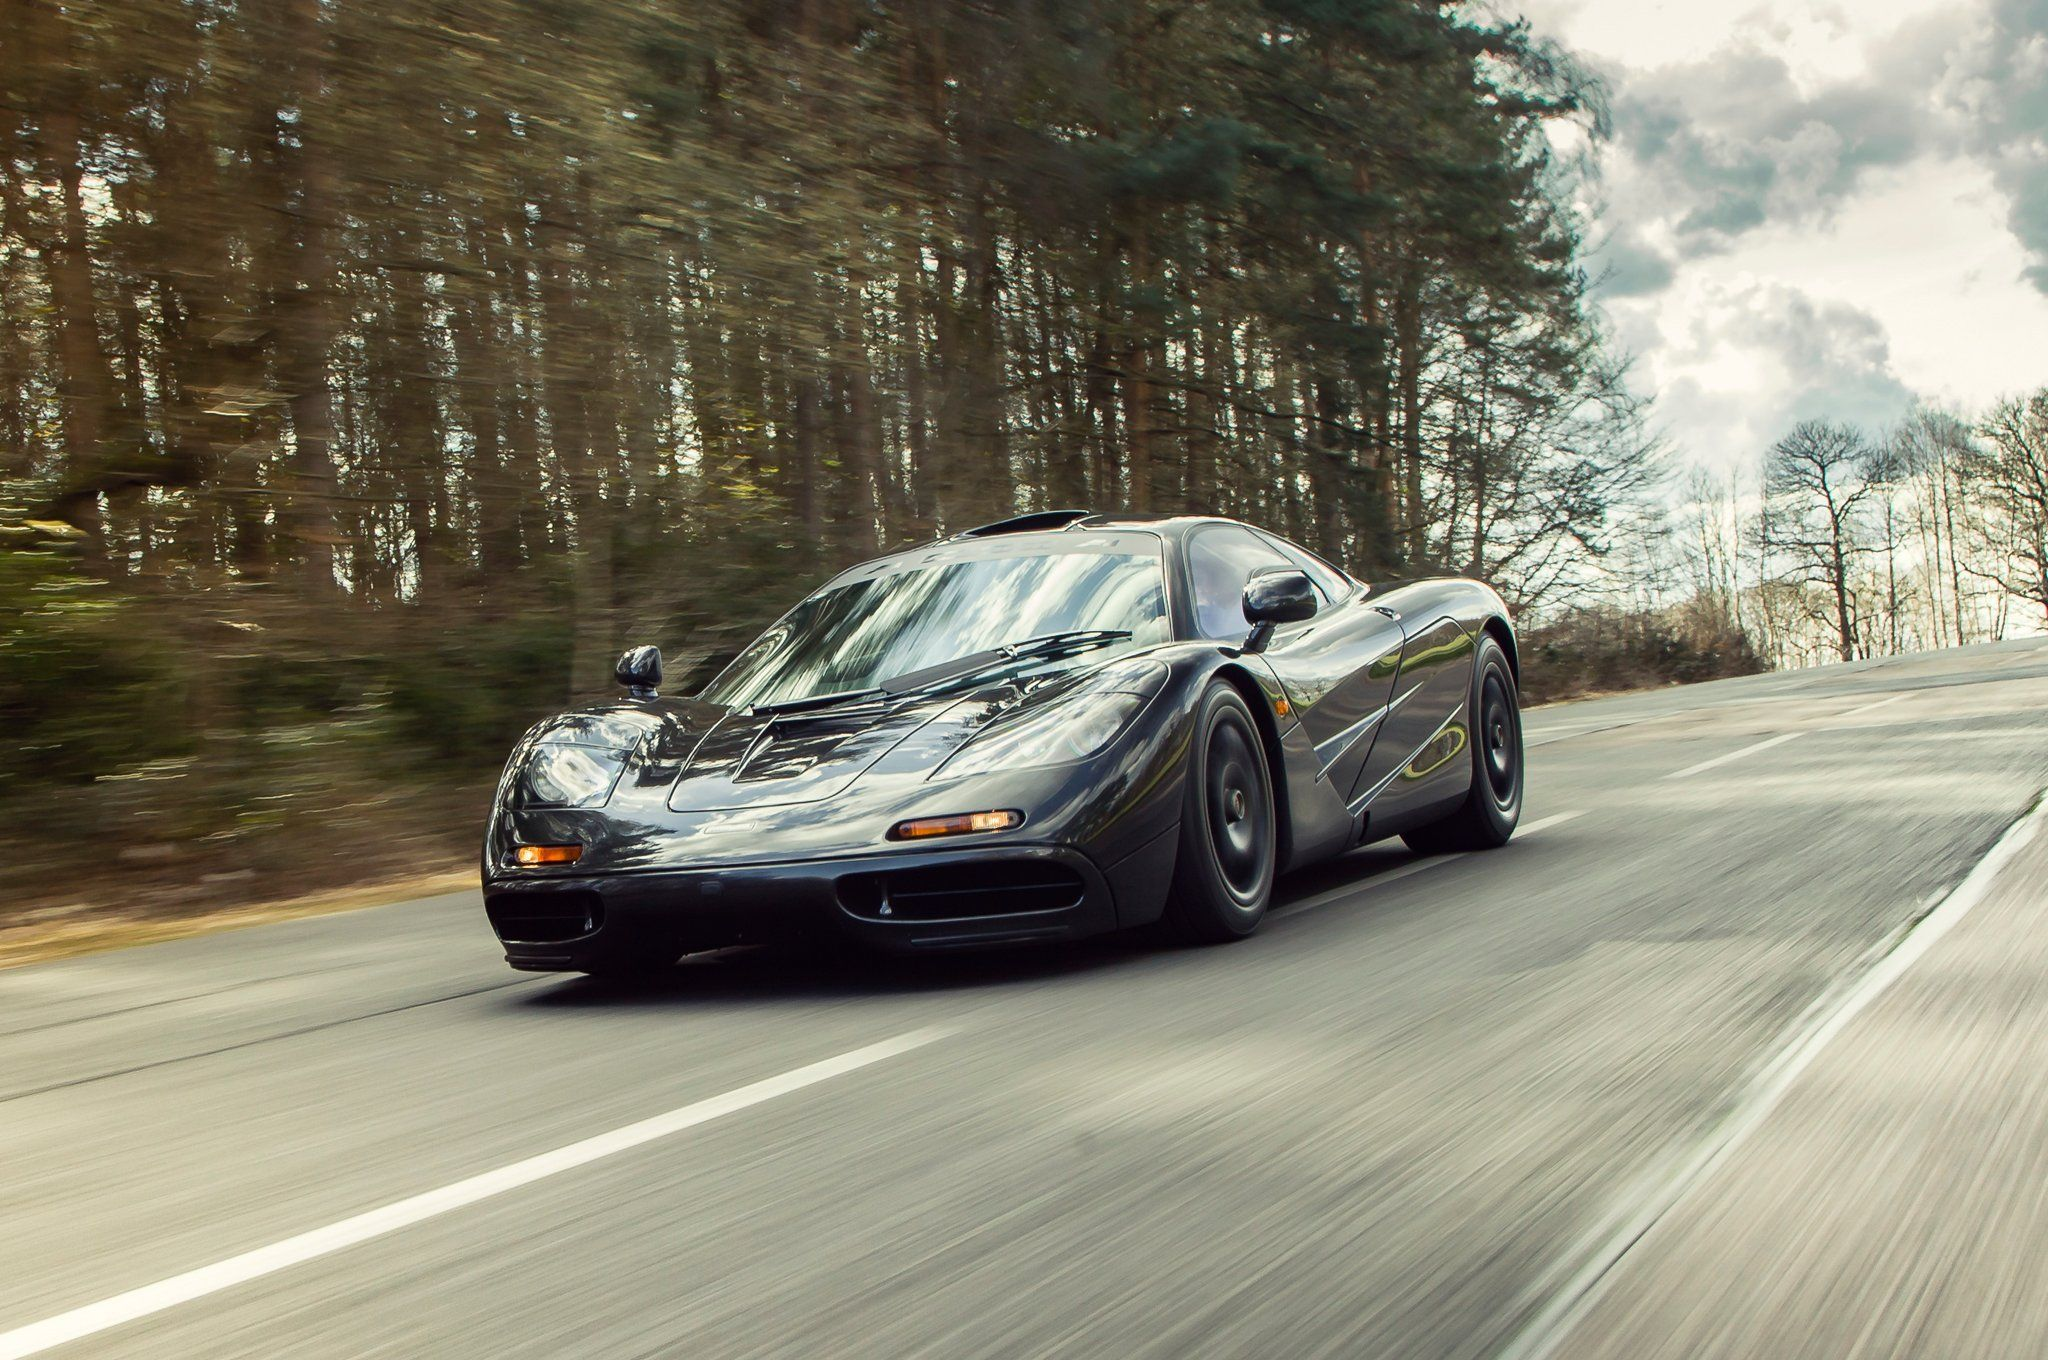 The Best Mclaren Cars Of All Time Mclaren F1 Super Cars Mclaren Cars